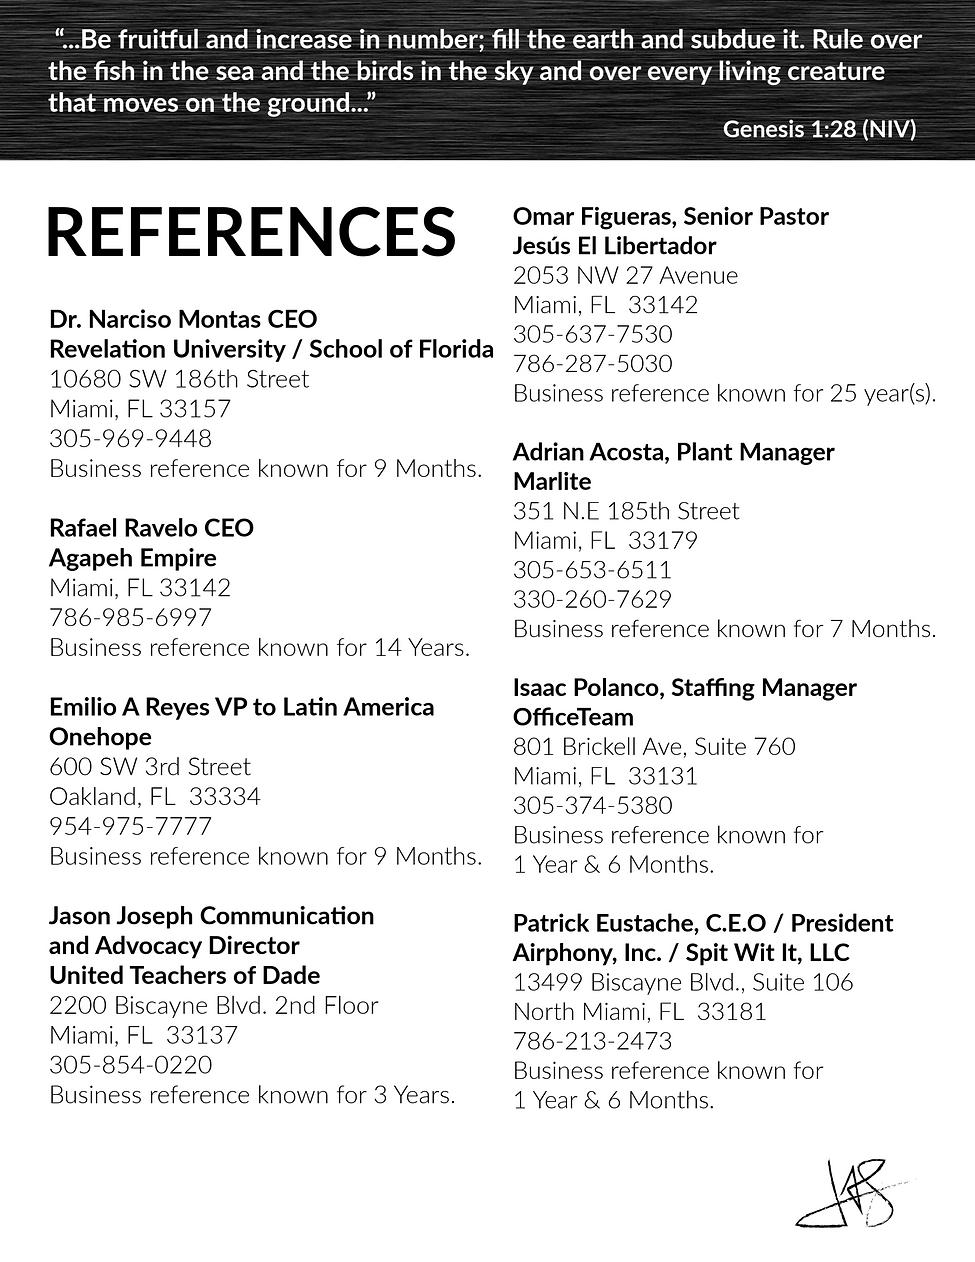 Josue A. Santiago Resume 2020 Pg 4.png